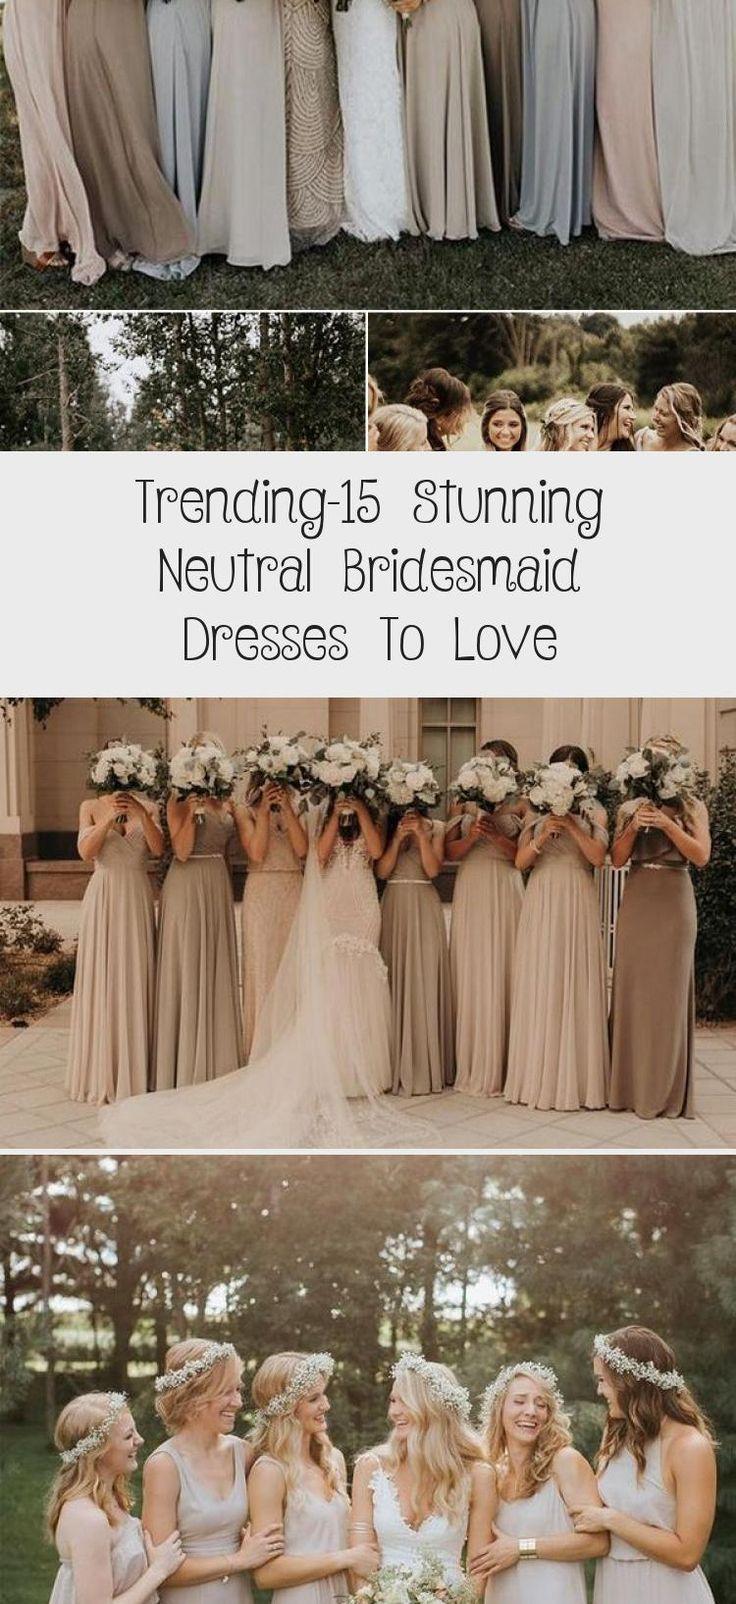 neutral champagne bridesmaid dresses #obde #weddingideas2019 #WhiteBridesmaidDresses #BridesmaidDressesColors #ElegantBridesmaidDresses #IvoryBridesmaidDresses #BridesmaidDressesMuslim